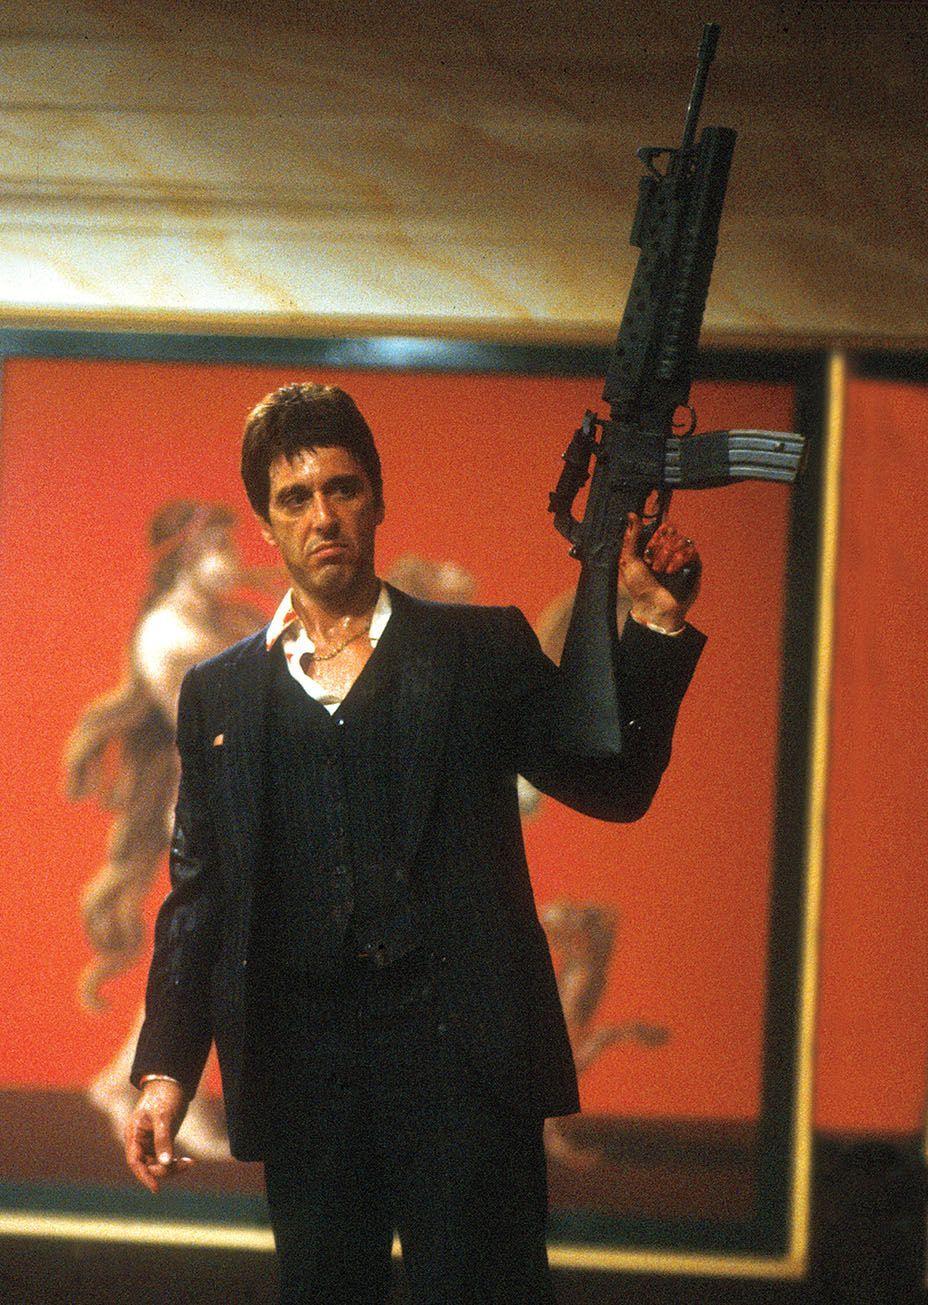 54ab7e1d7411ea The gun industry's lucrative relationship with Hollywood Фон, Вінтажні  Фільми, Фон Для Телефону,